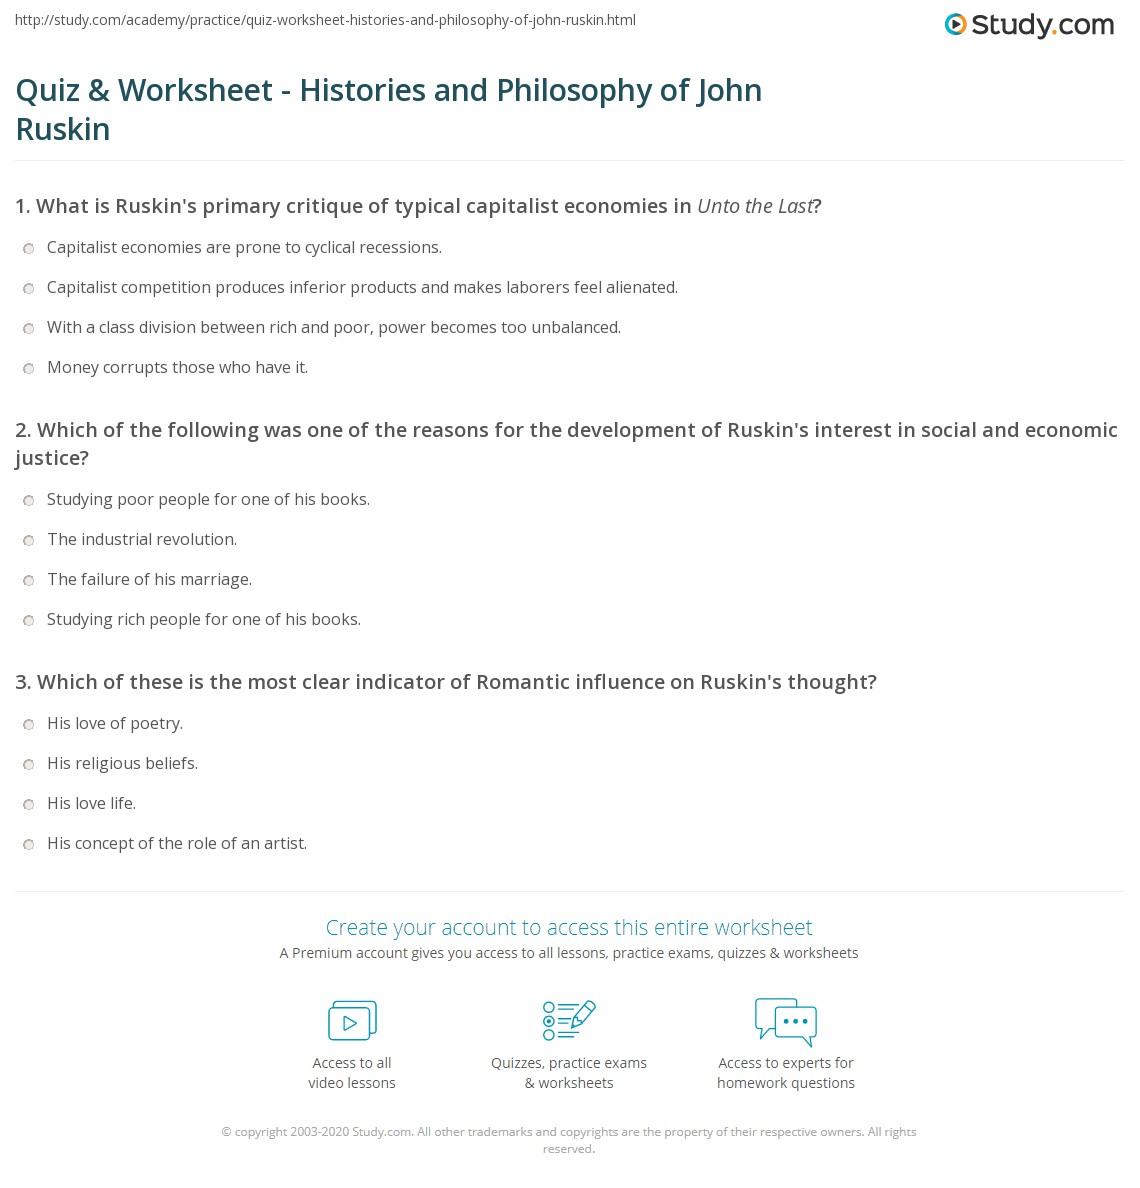 Paring Economic Systems Worksheet